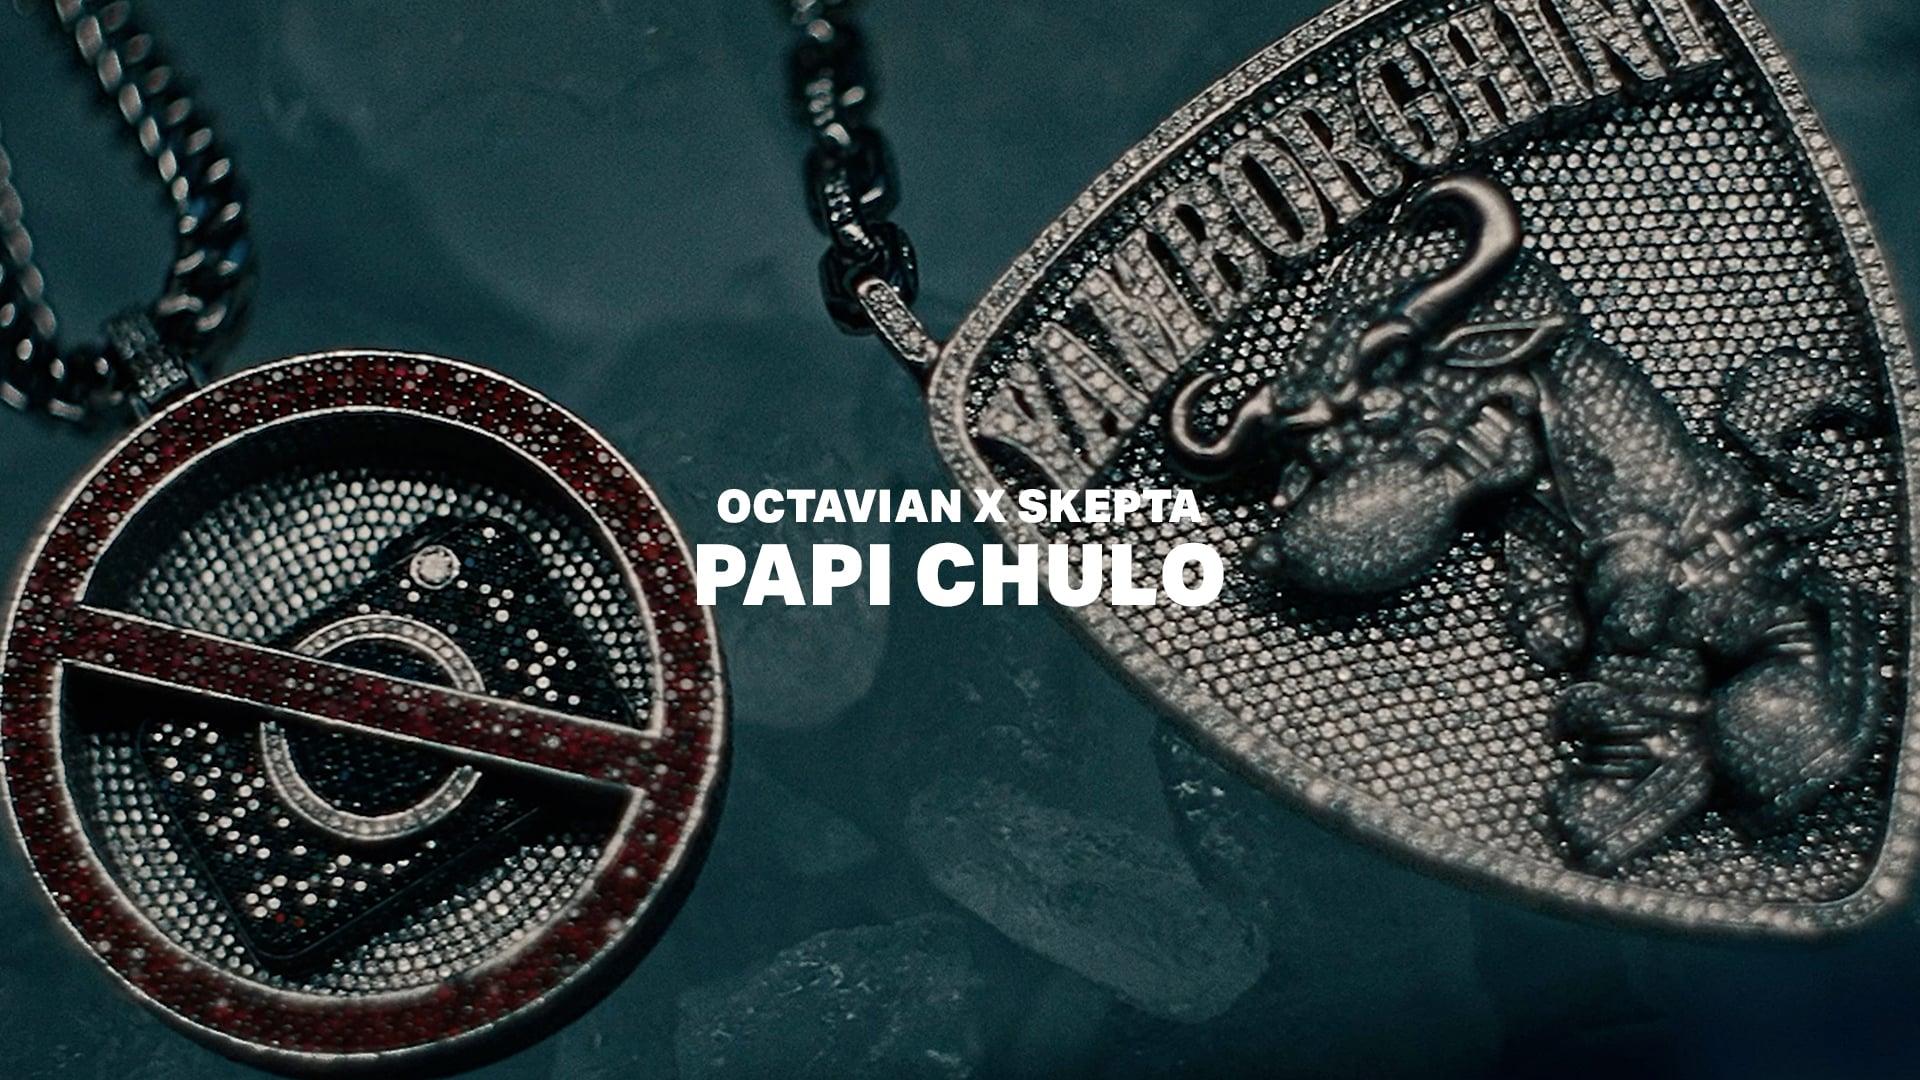 OCTAVIAN x SKEPTA ▲ 'Papi Chulo'